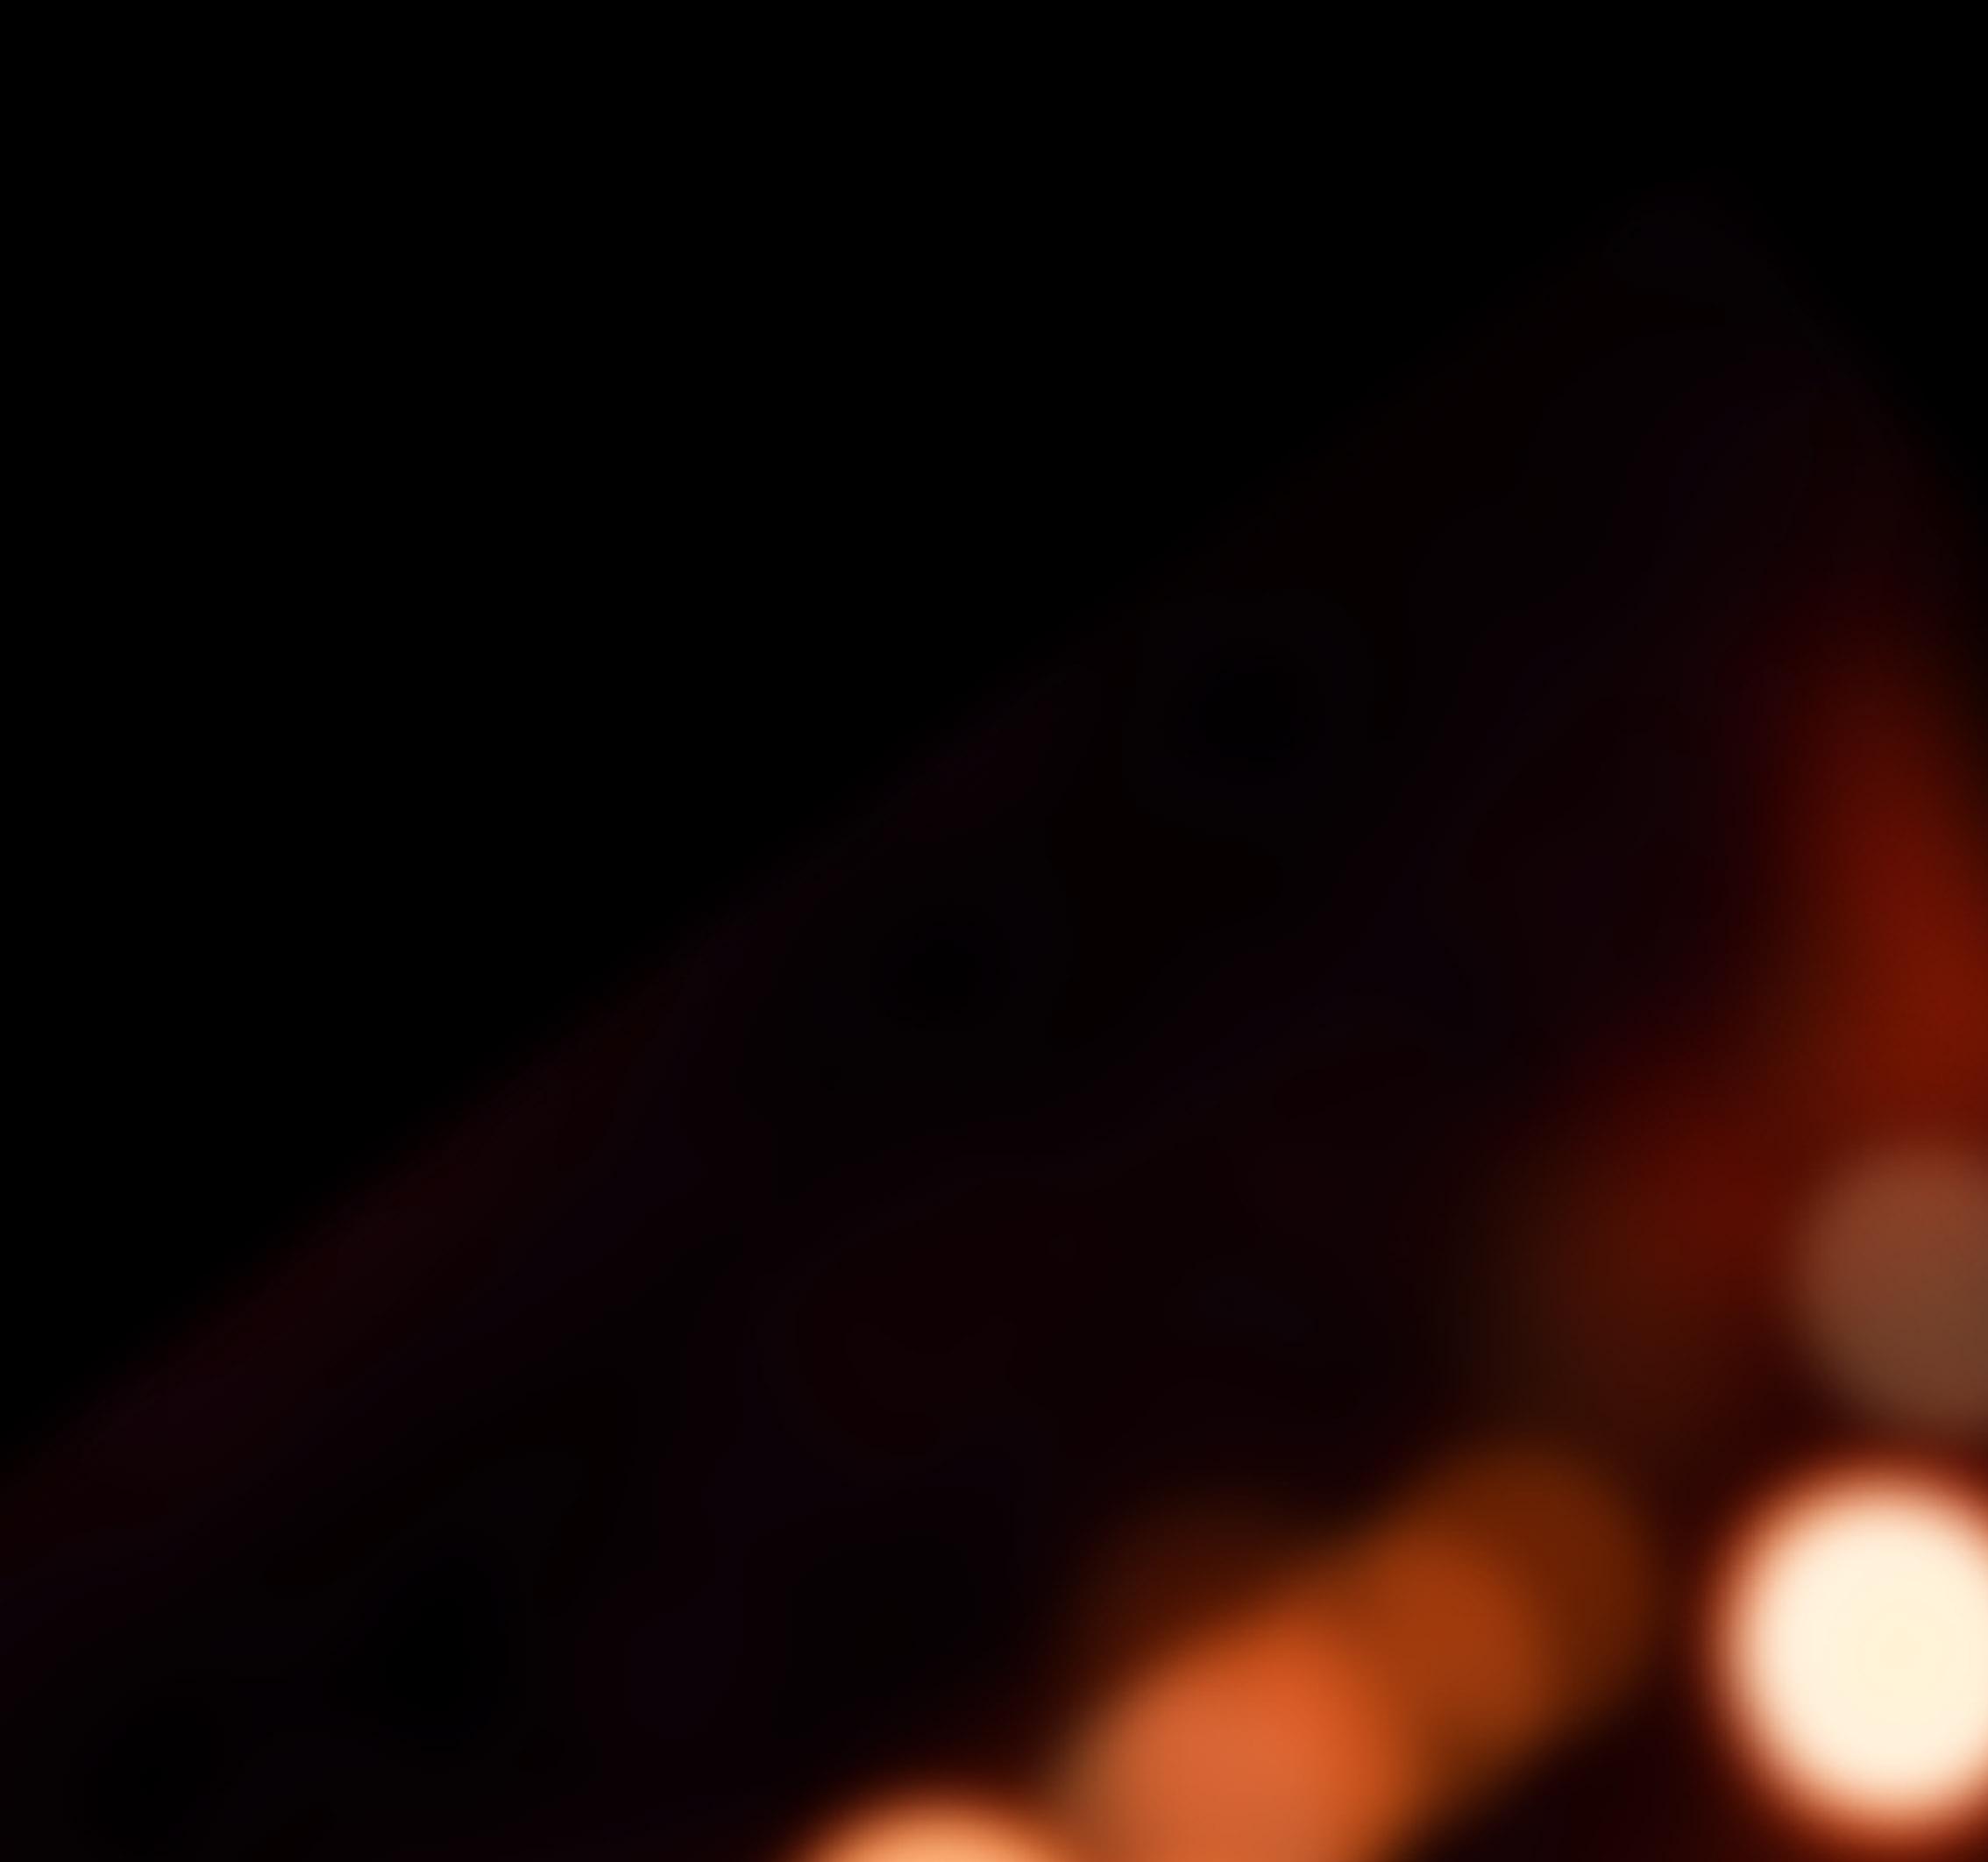 bookeh blur overlay